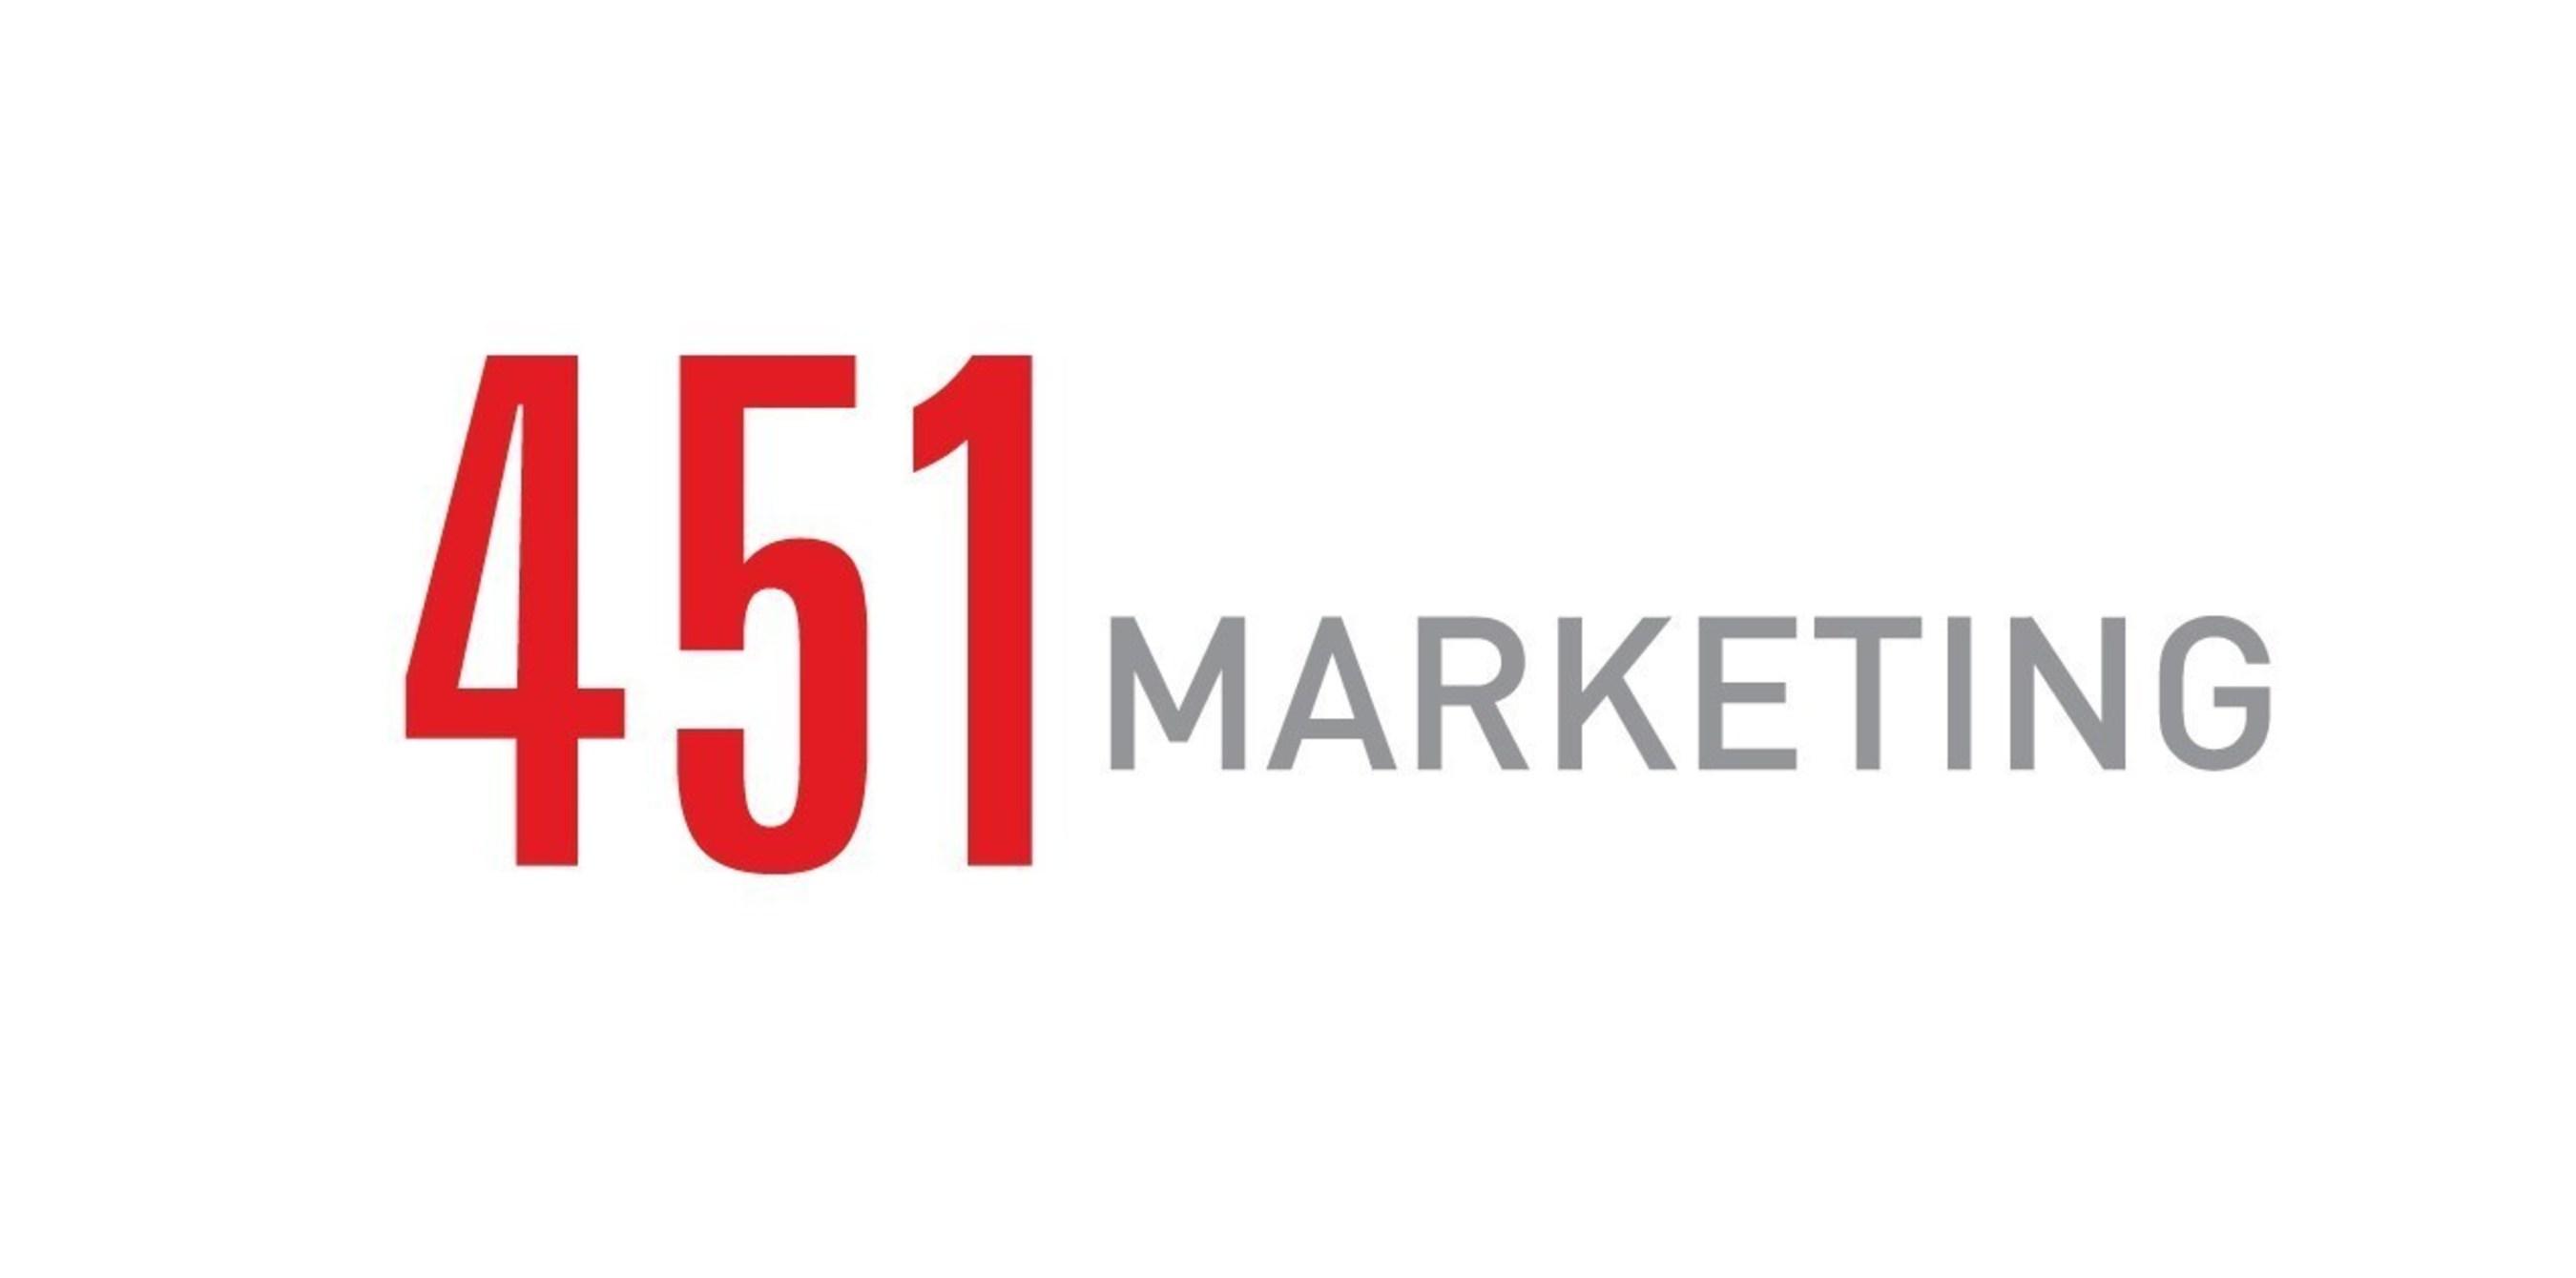 451 Marketing logo